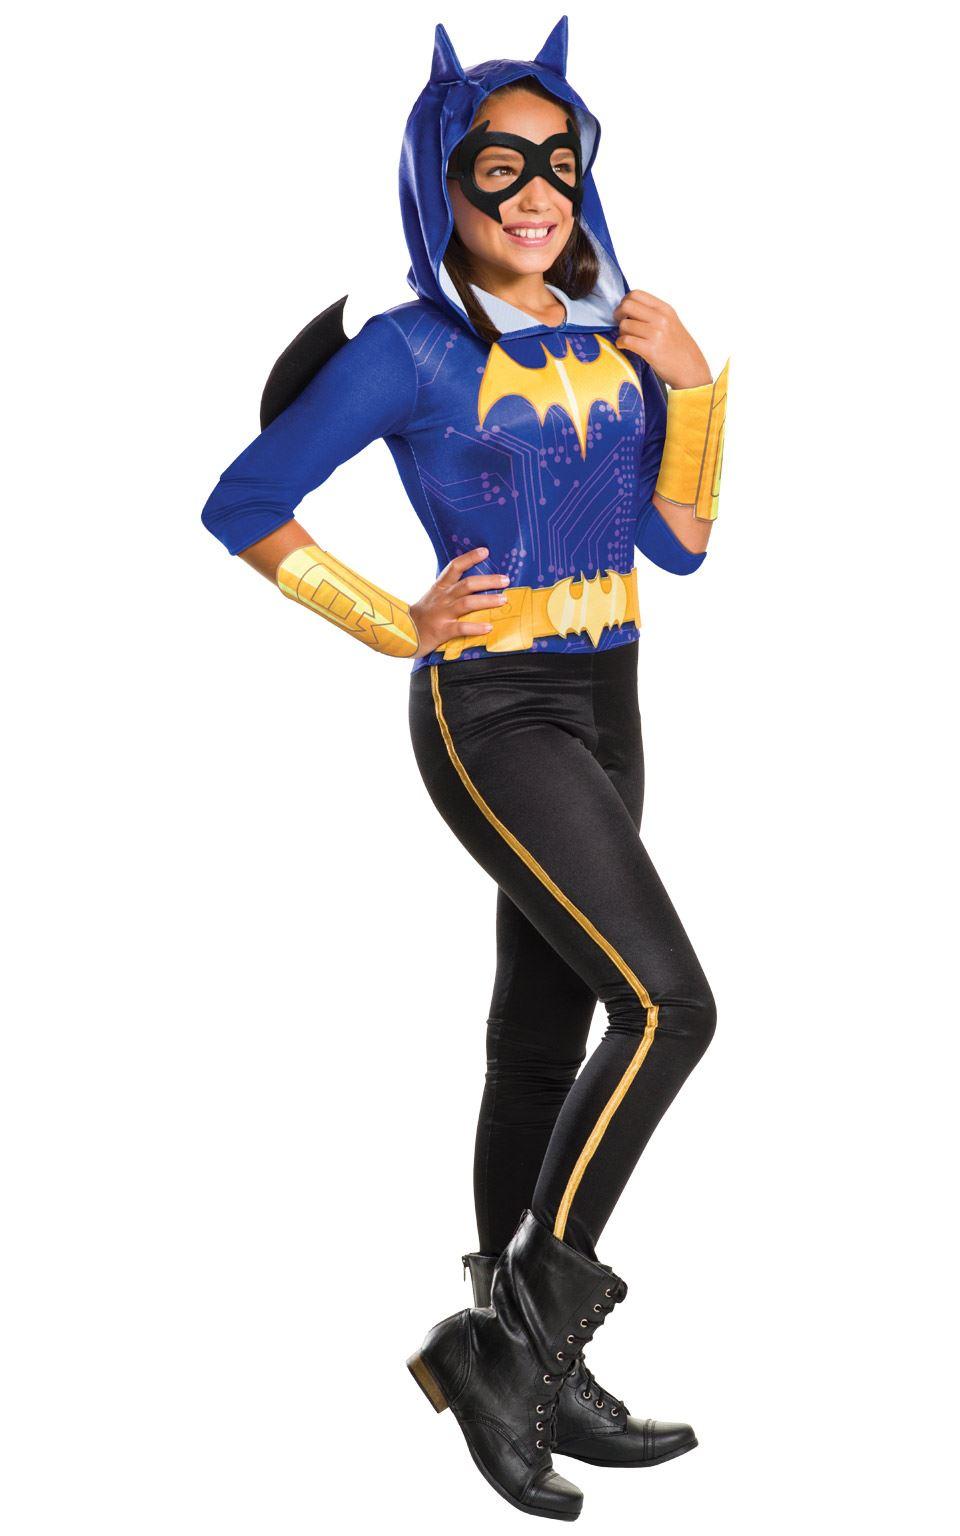 Girls-Batgirl-Costume-Superhero-Batman-Child-Halloween-Fancy-  sc 1 st  eBay & Girls Batgirl Costume Superhero Batman Child Halloween Fancy Dress ...